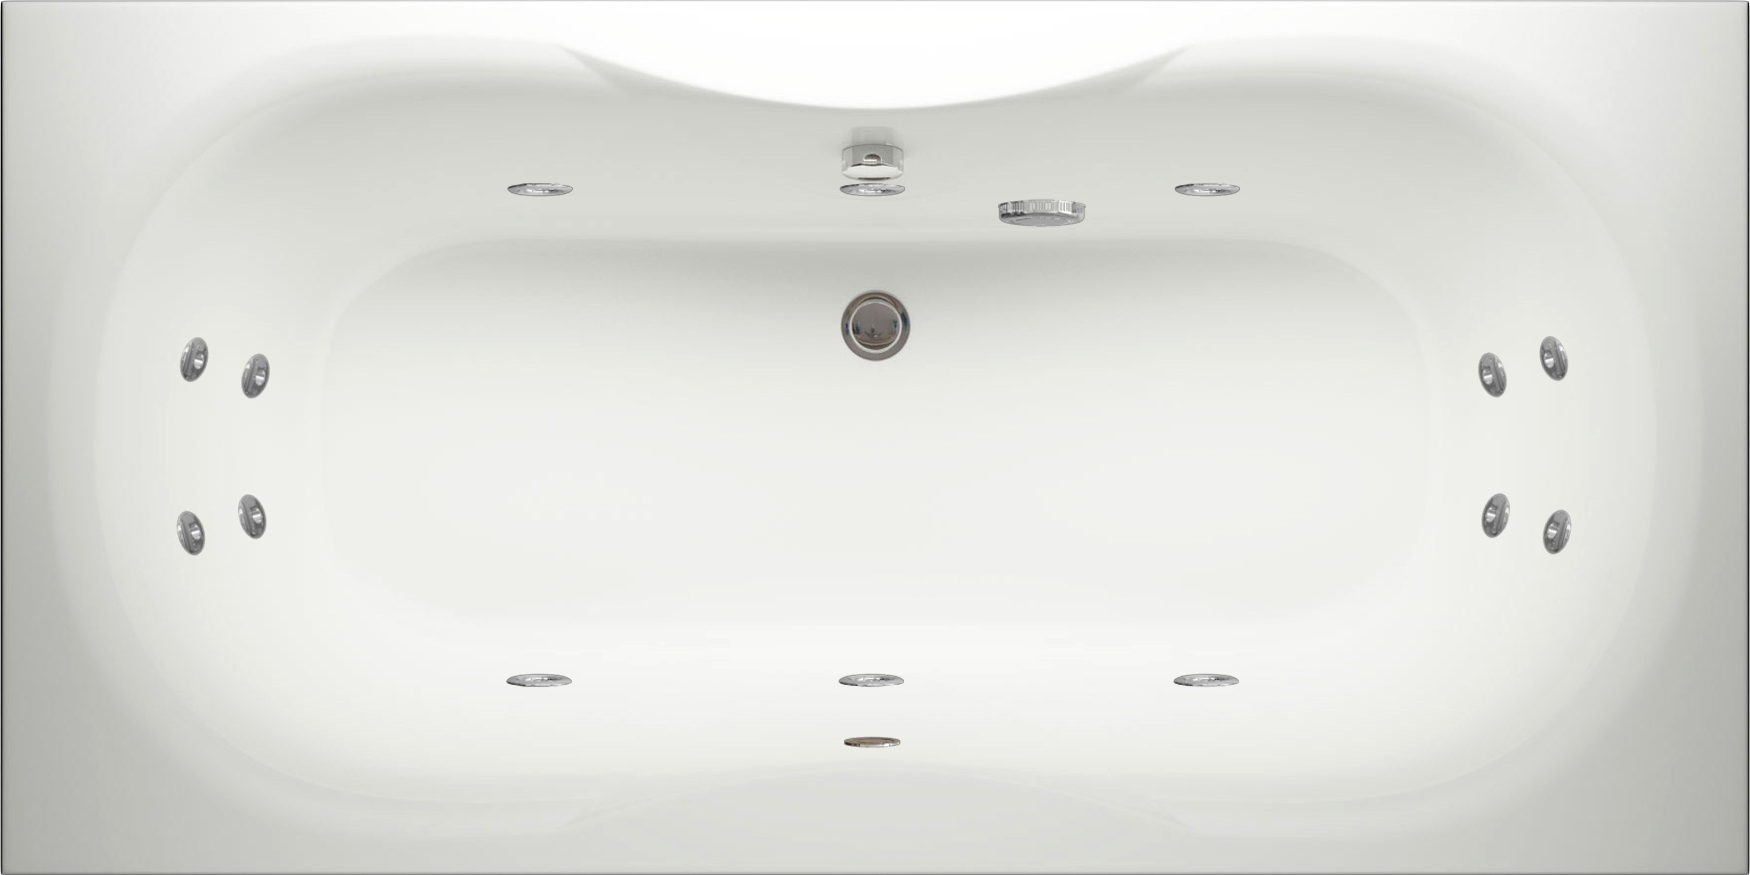 Quantum Whirlpool Bath Tubs UK Online | Luna Spas